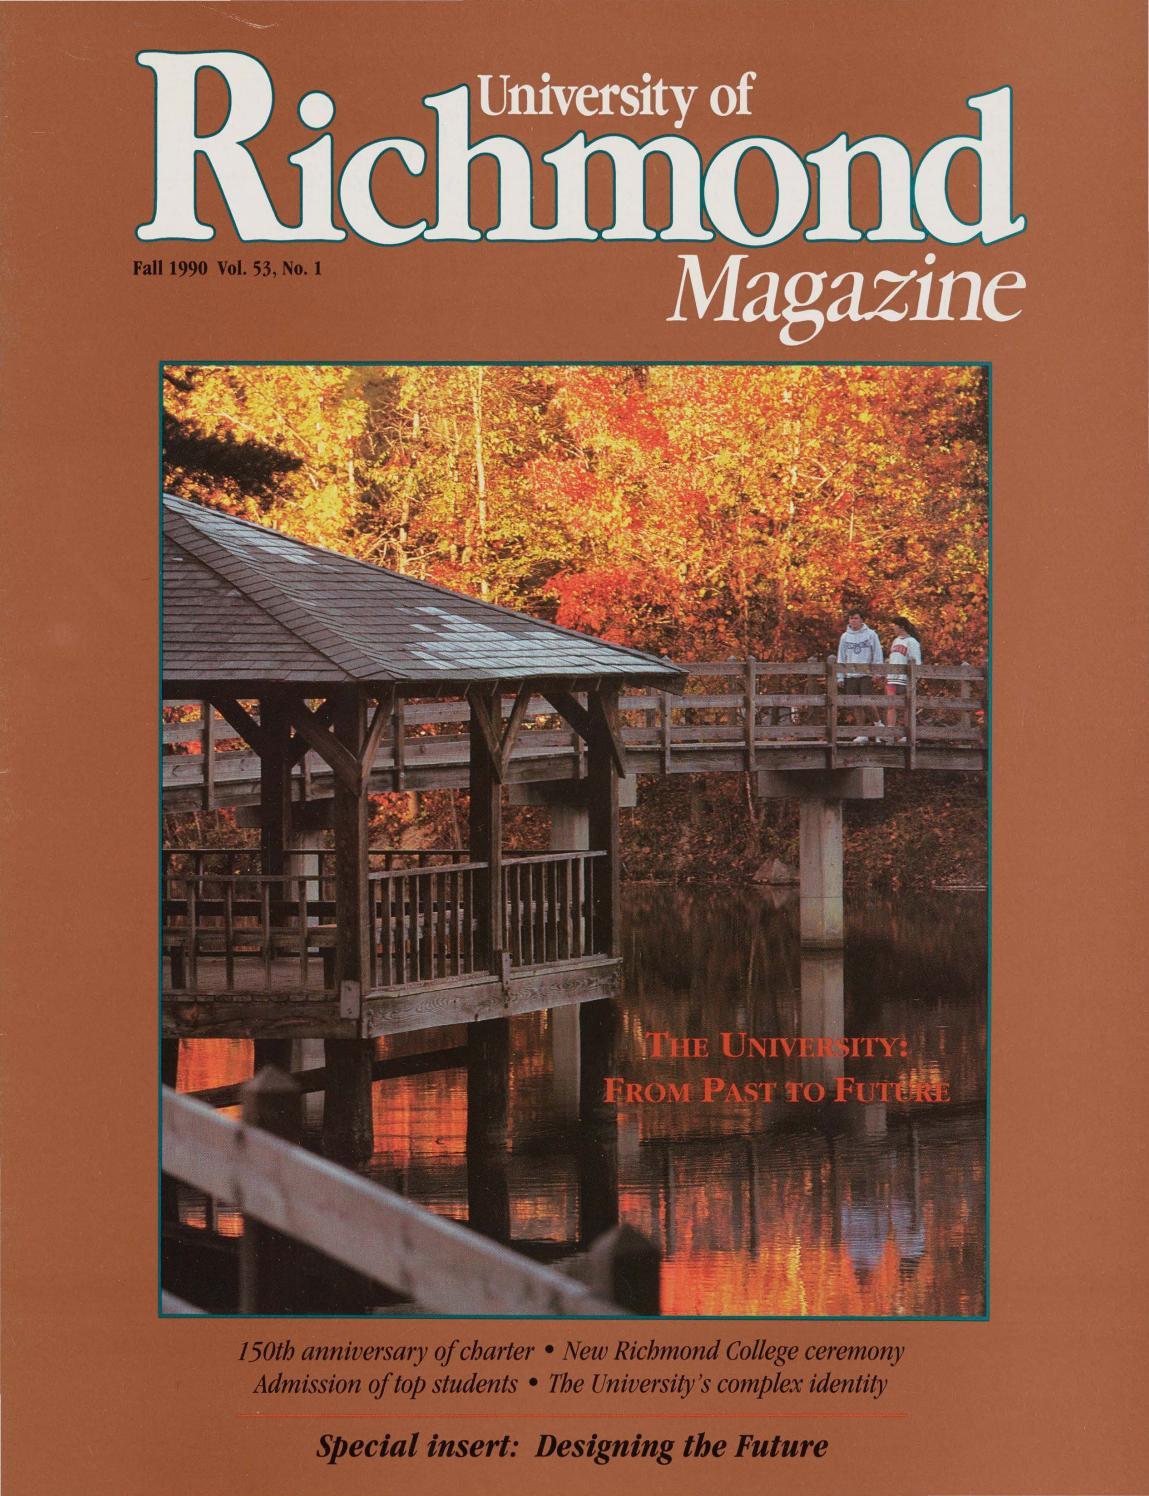 bf197d4361ee5 University of Richmond Magazine Fall 1990 by UR Scholarship Repository -  issuu